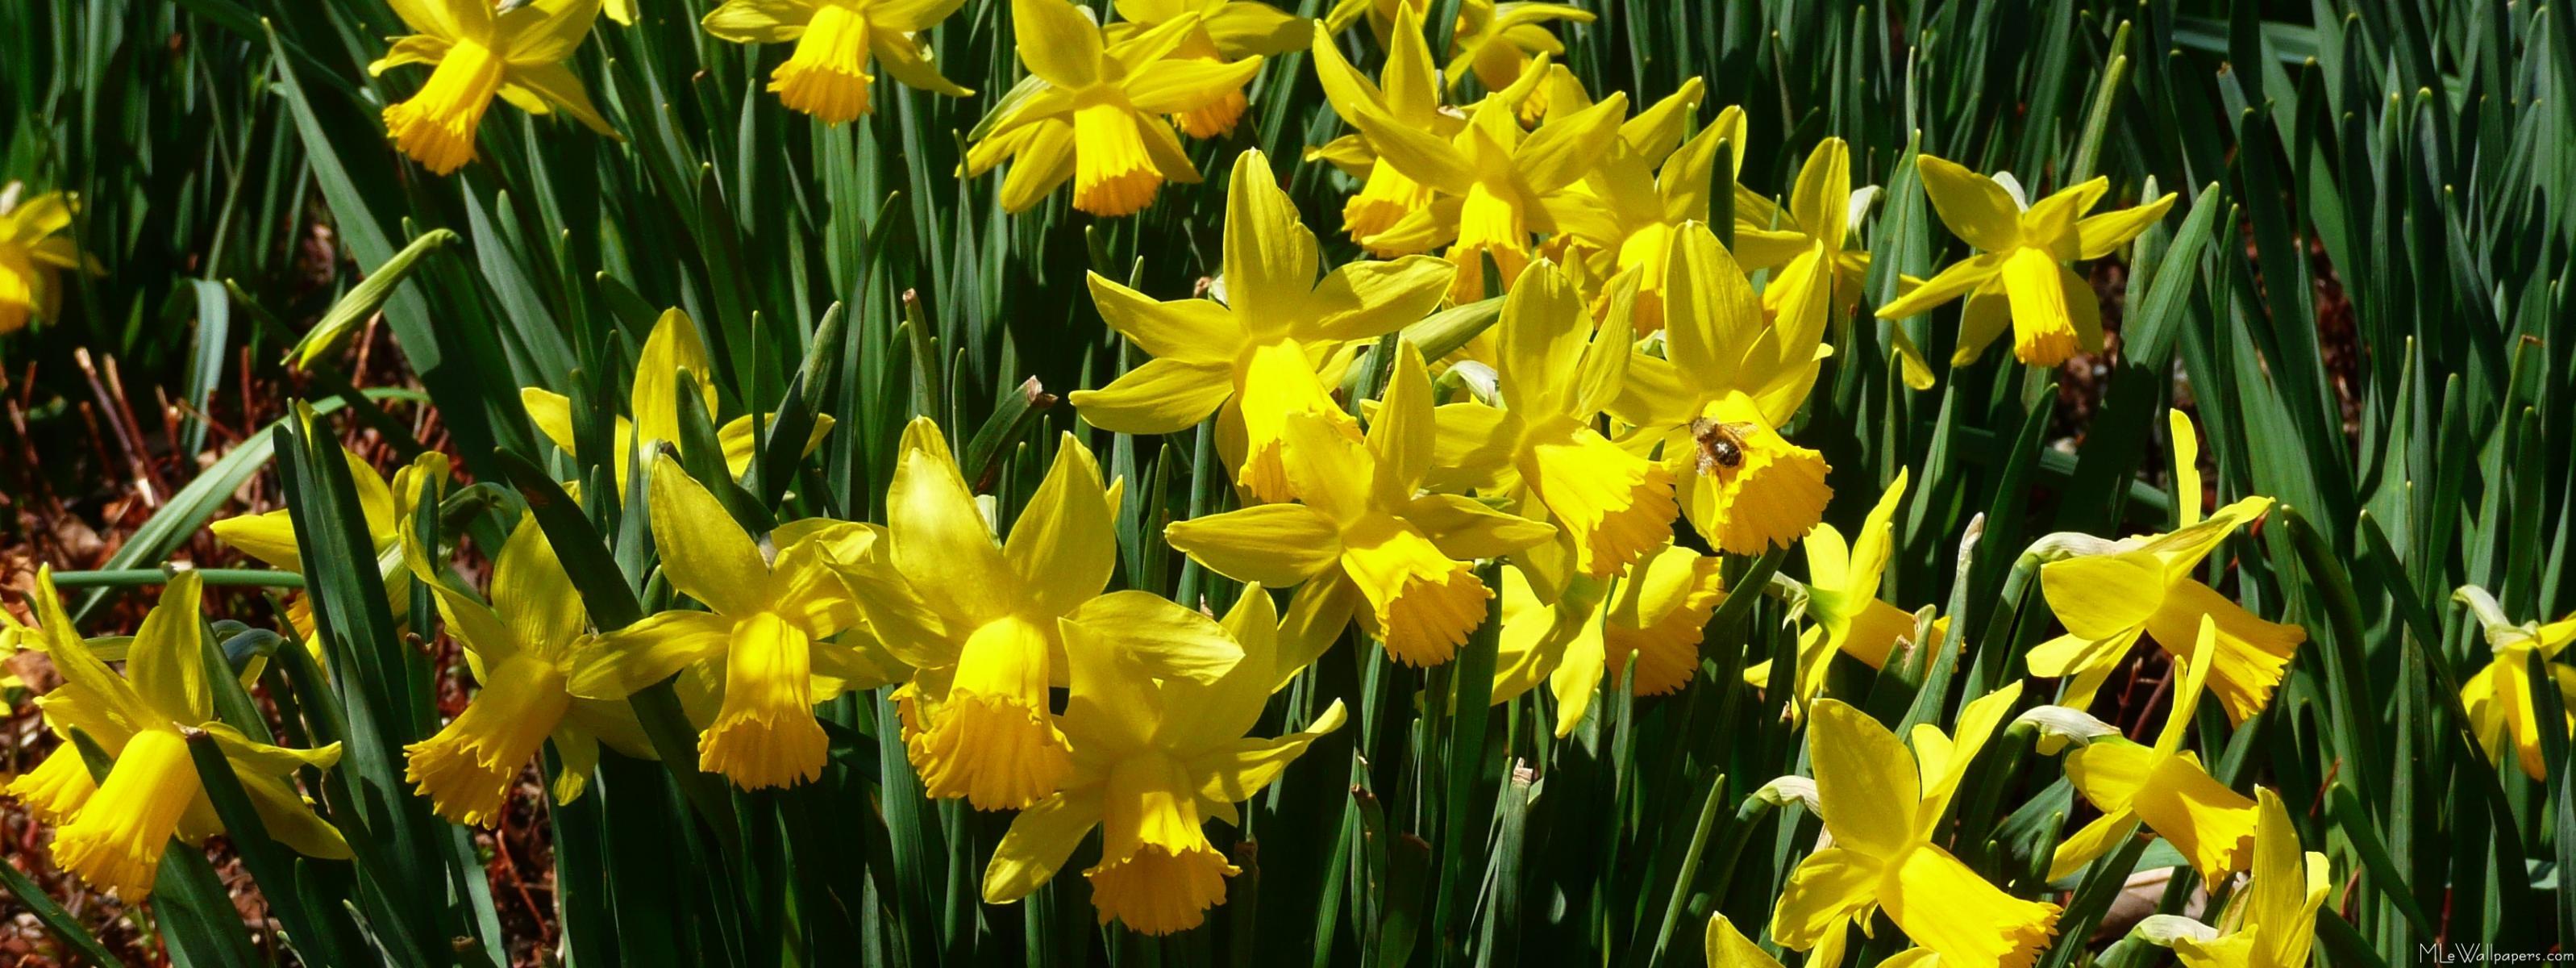 Yellow Daffodils Wallpaper Yellow Daffodils i